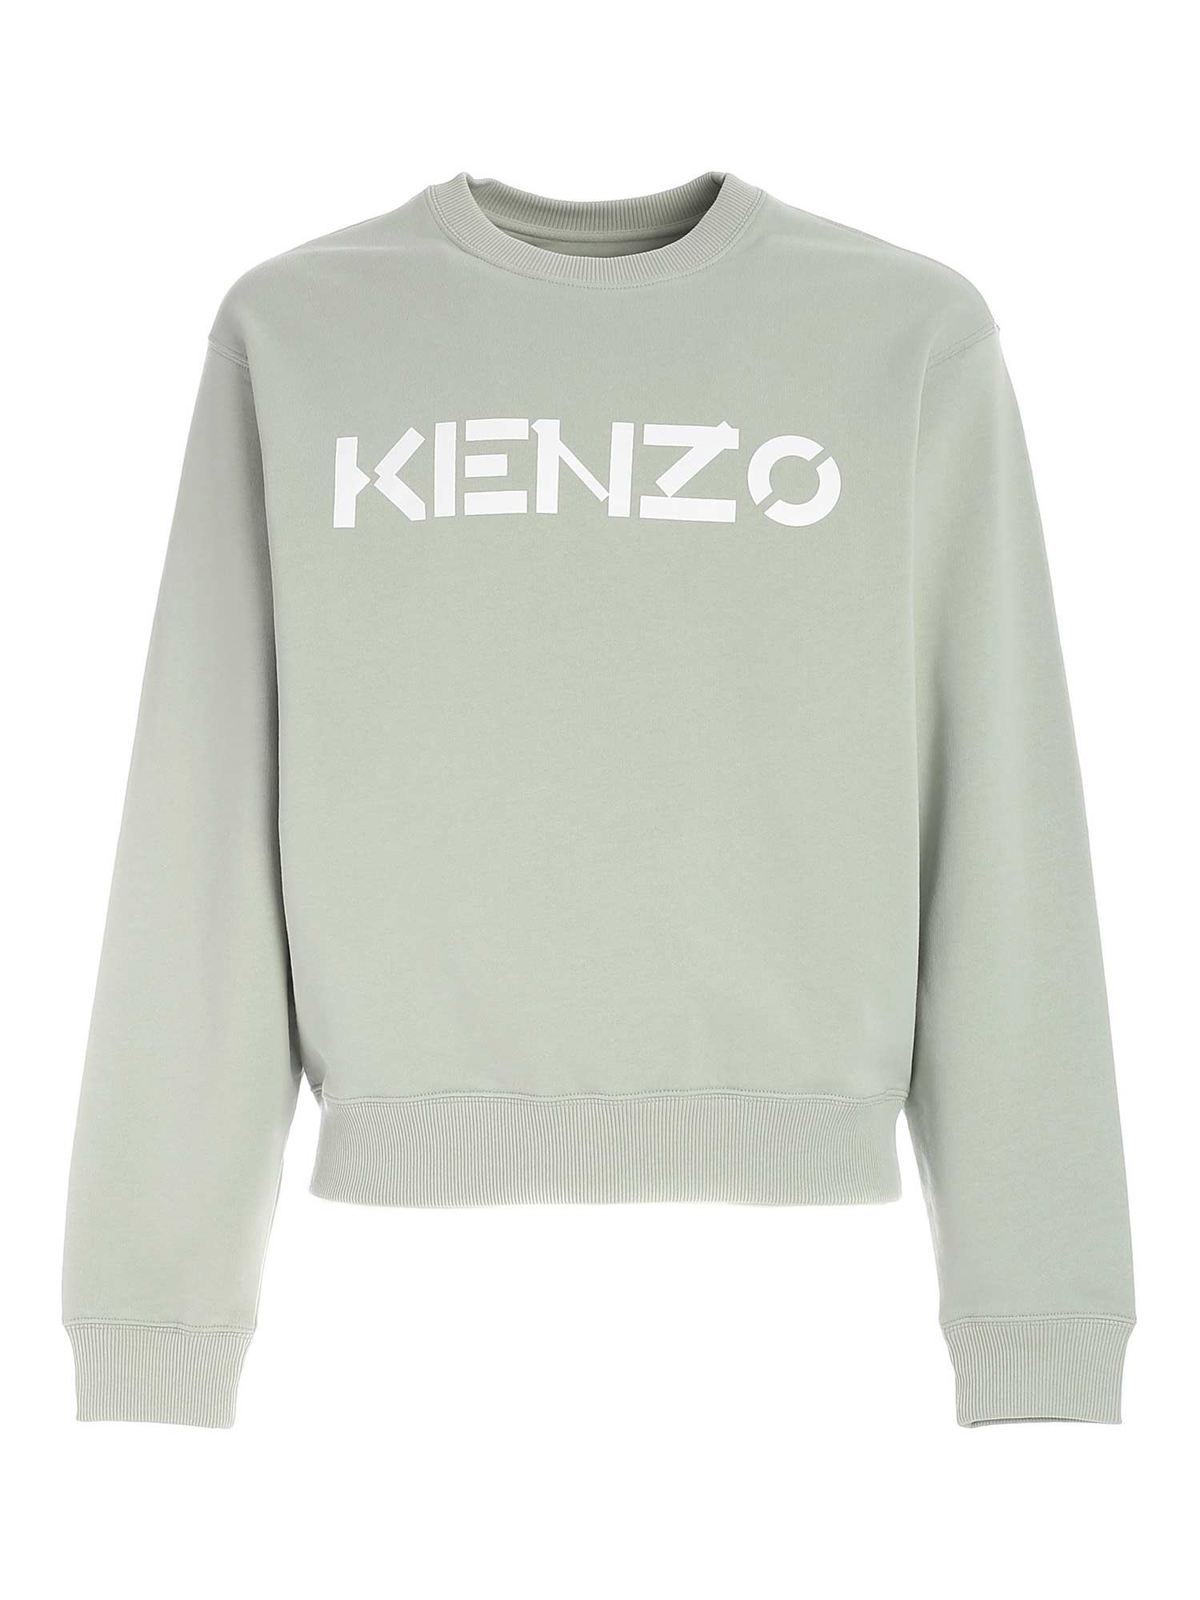 Kenzo Cottons LOGO PRINT SWEATSHIRT IN GREEN